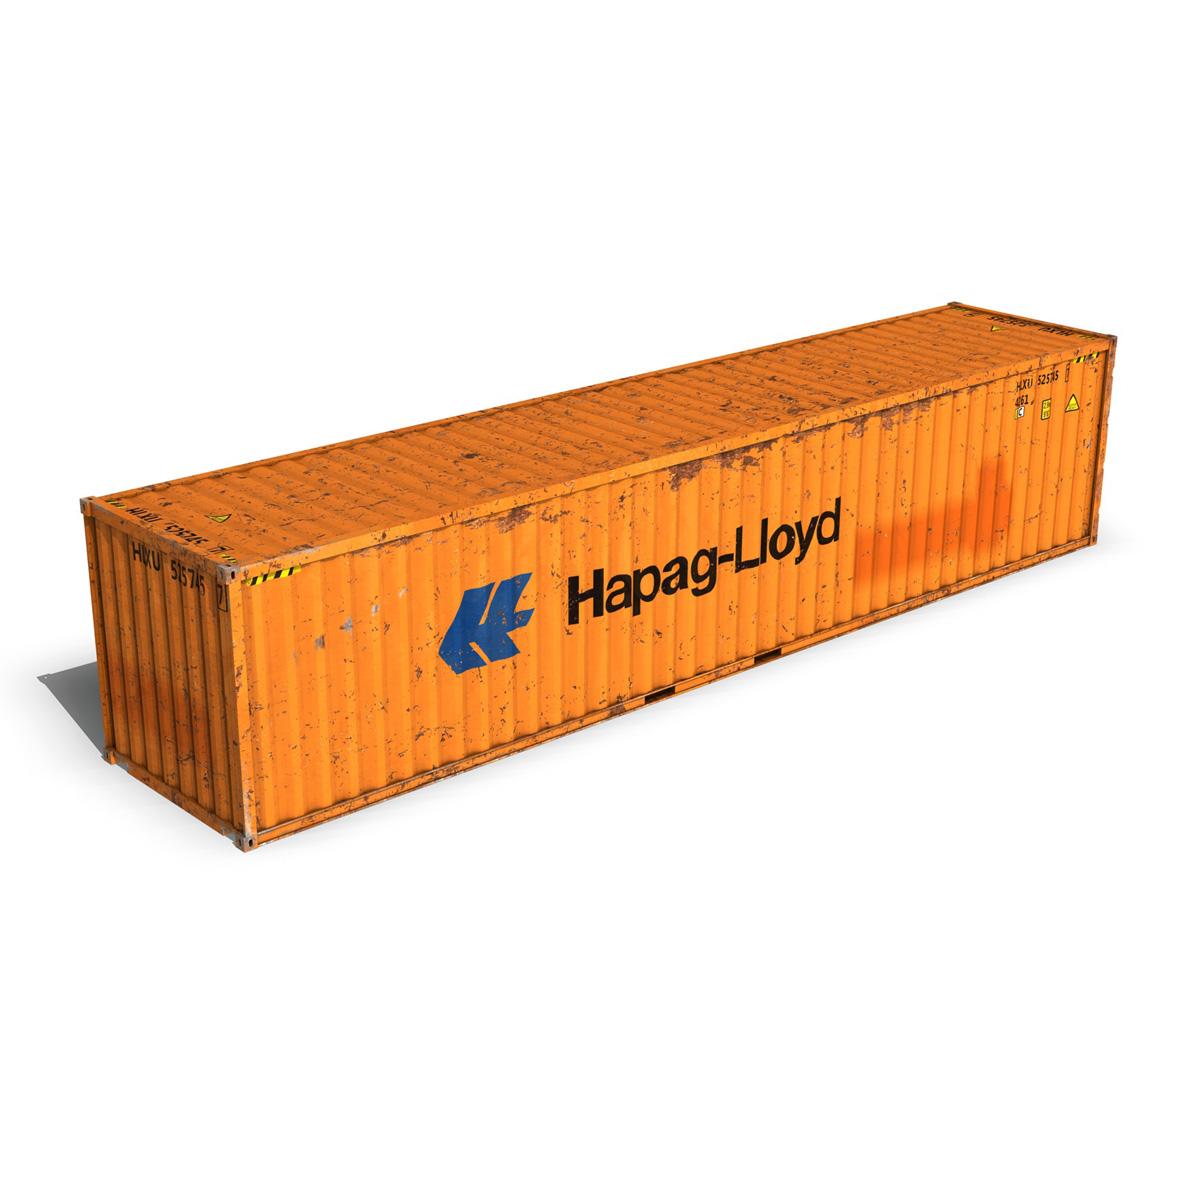 40ft тээврийн чингэлэг - hapag lloyd 3d загвар 3ds fbx lwo lws obj c4d 264962